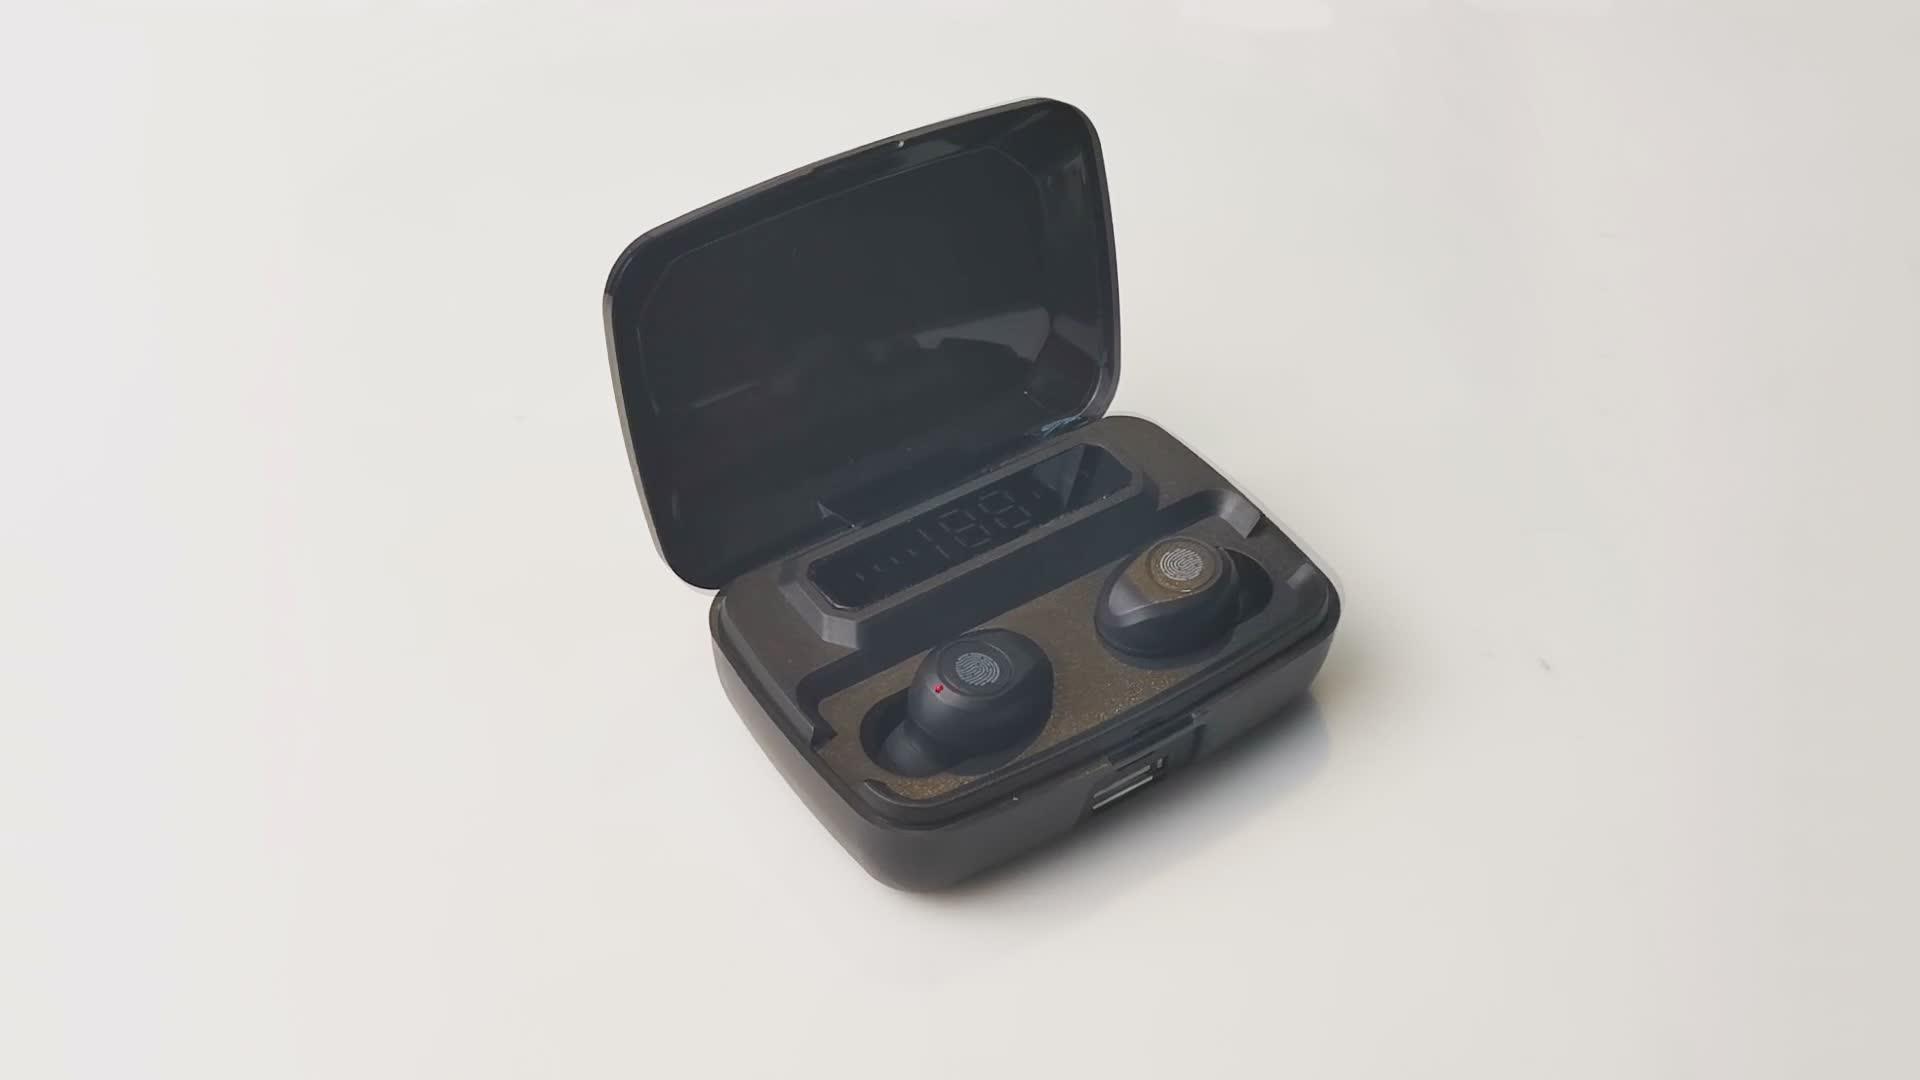 Earphones wireless ear pod M8W button headphone phones earbuds Good Sound Quality Wireless Stereo Headphone Headset